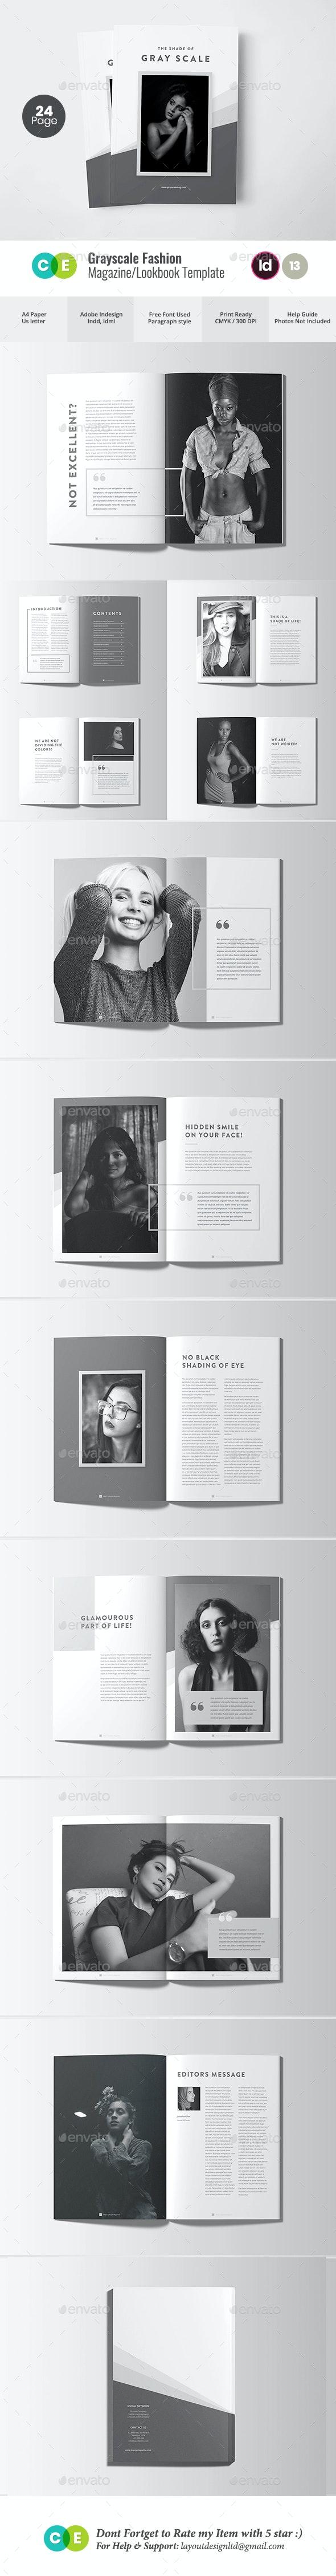 Grayscale Fashion Magazine Lookbook V13 - Magazines Print Templates